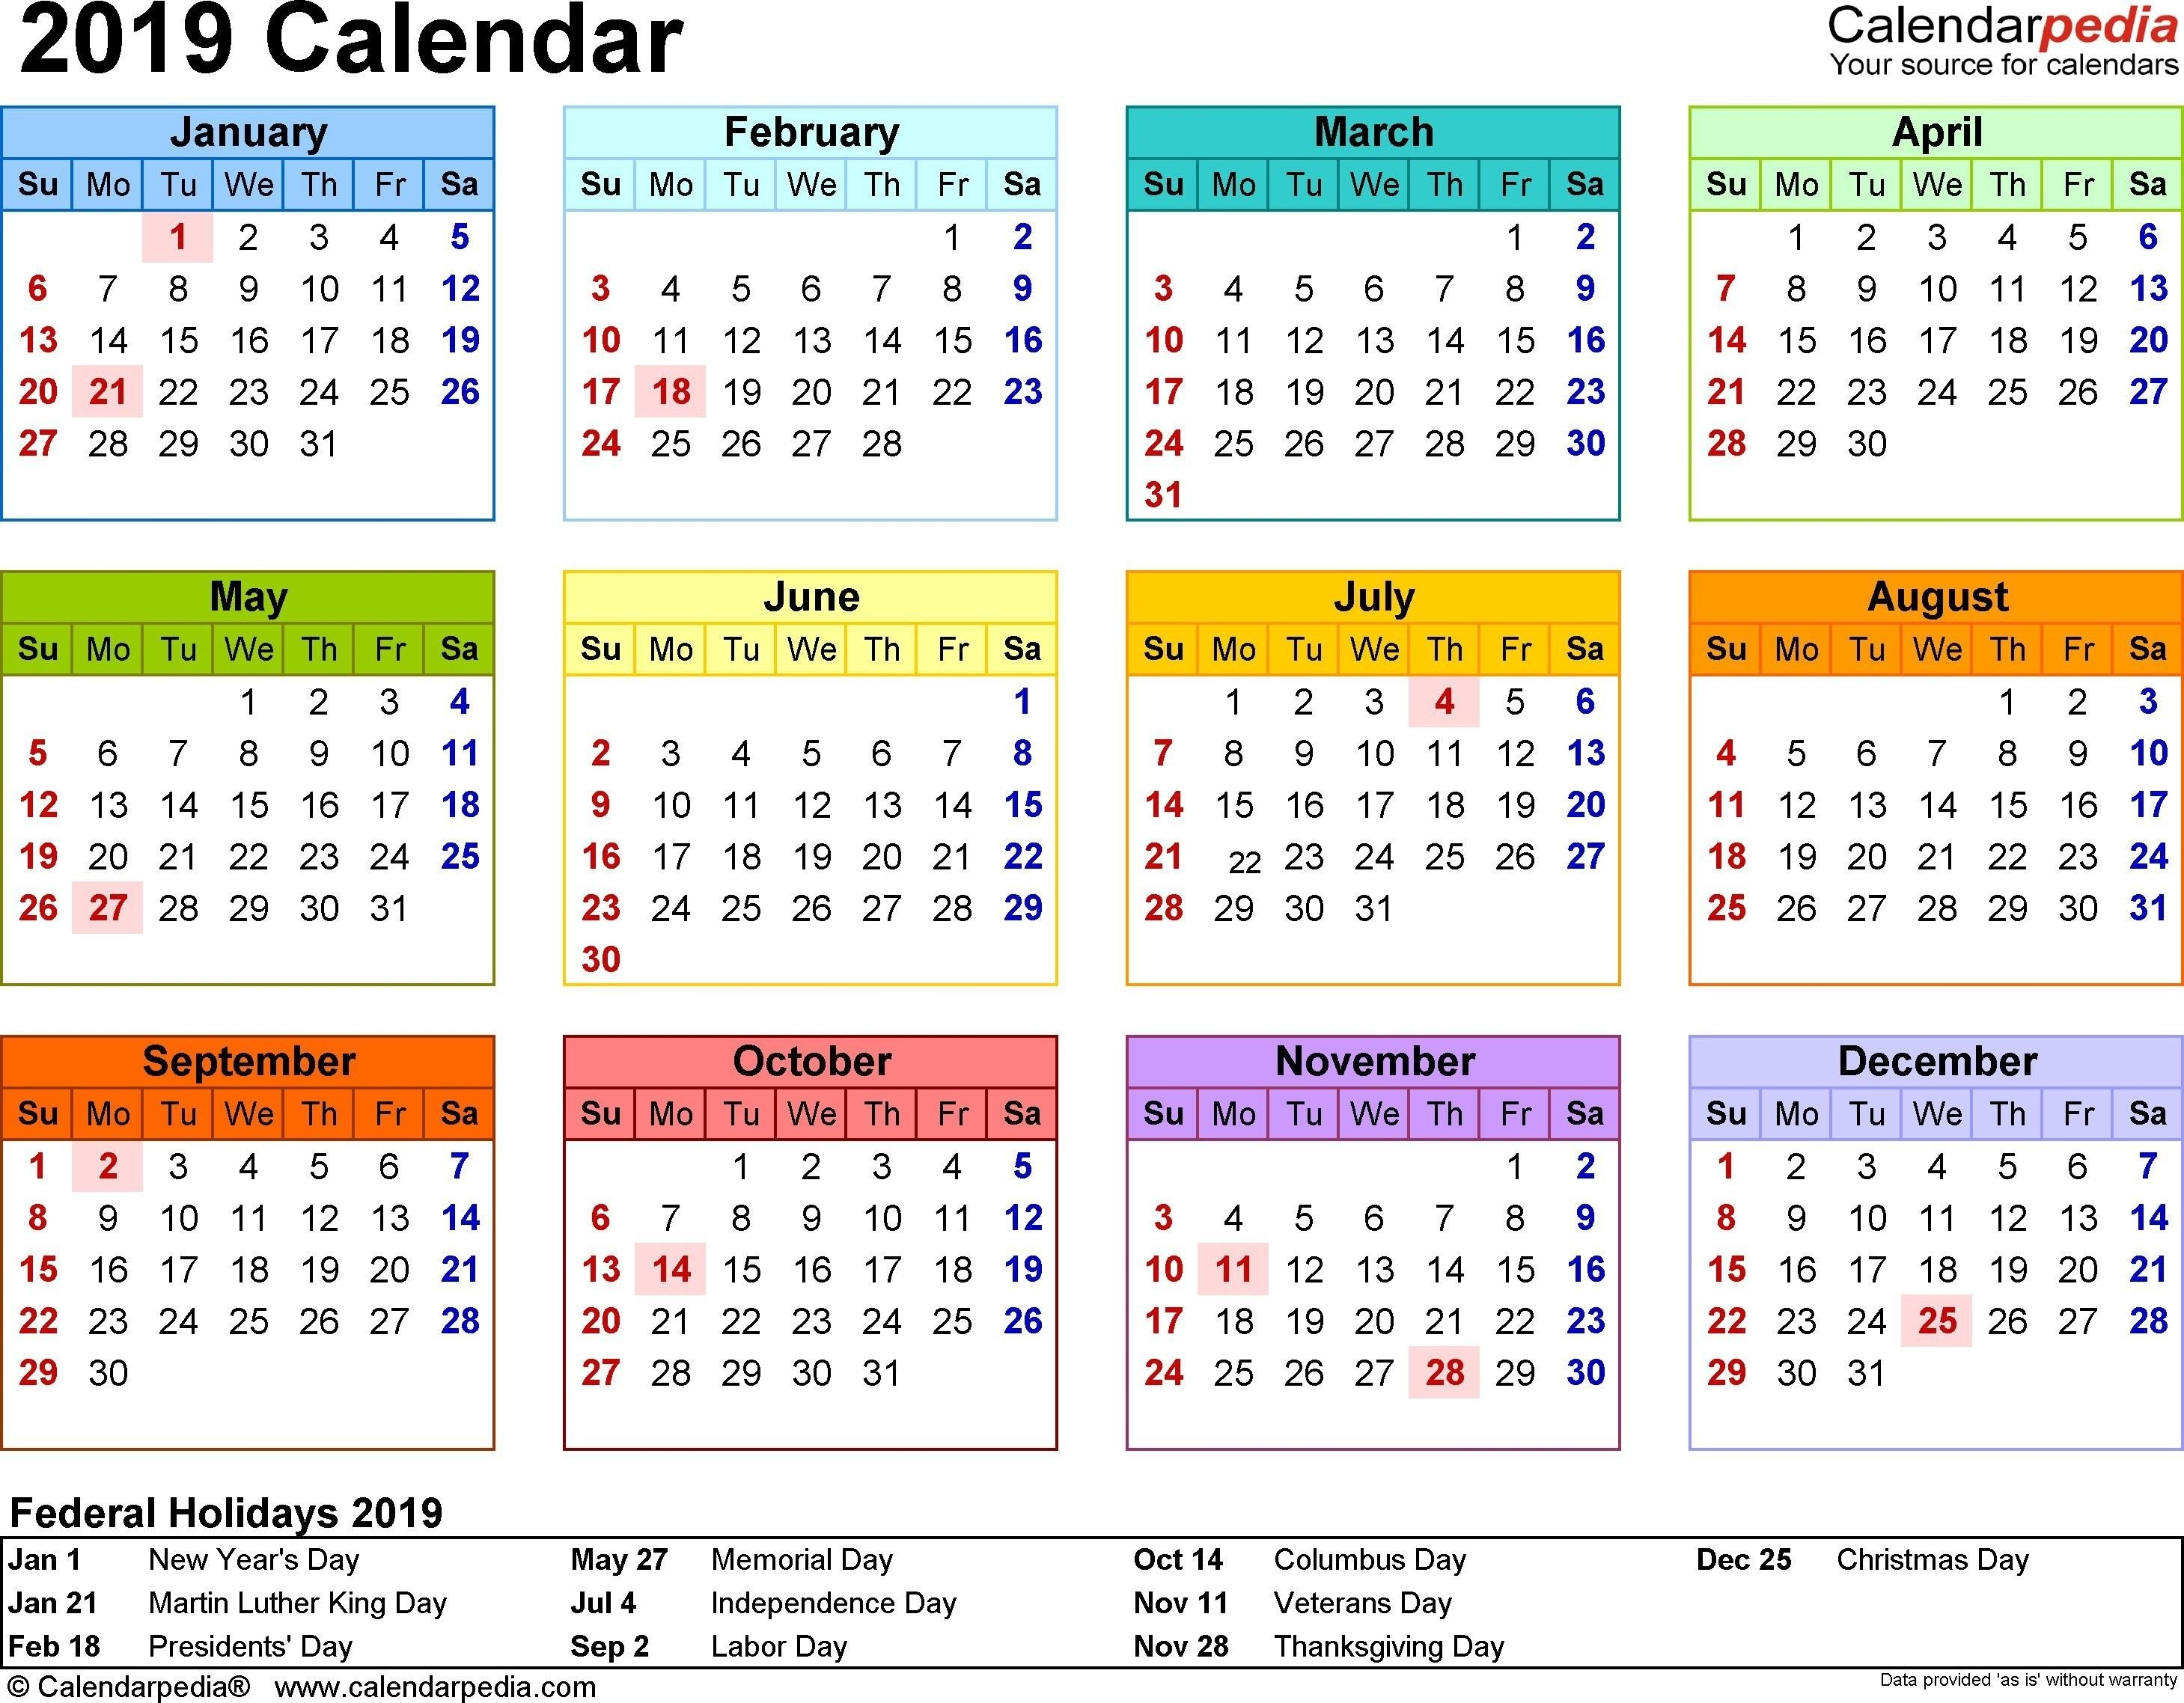 April 7 2019 Calendar | Calendar Format Example April 7 2019 Calendar